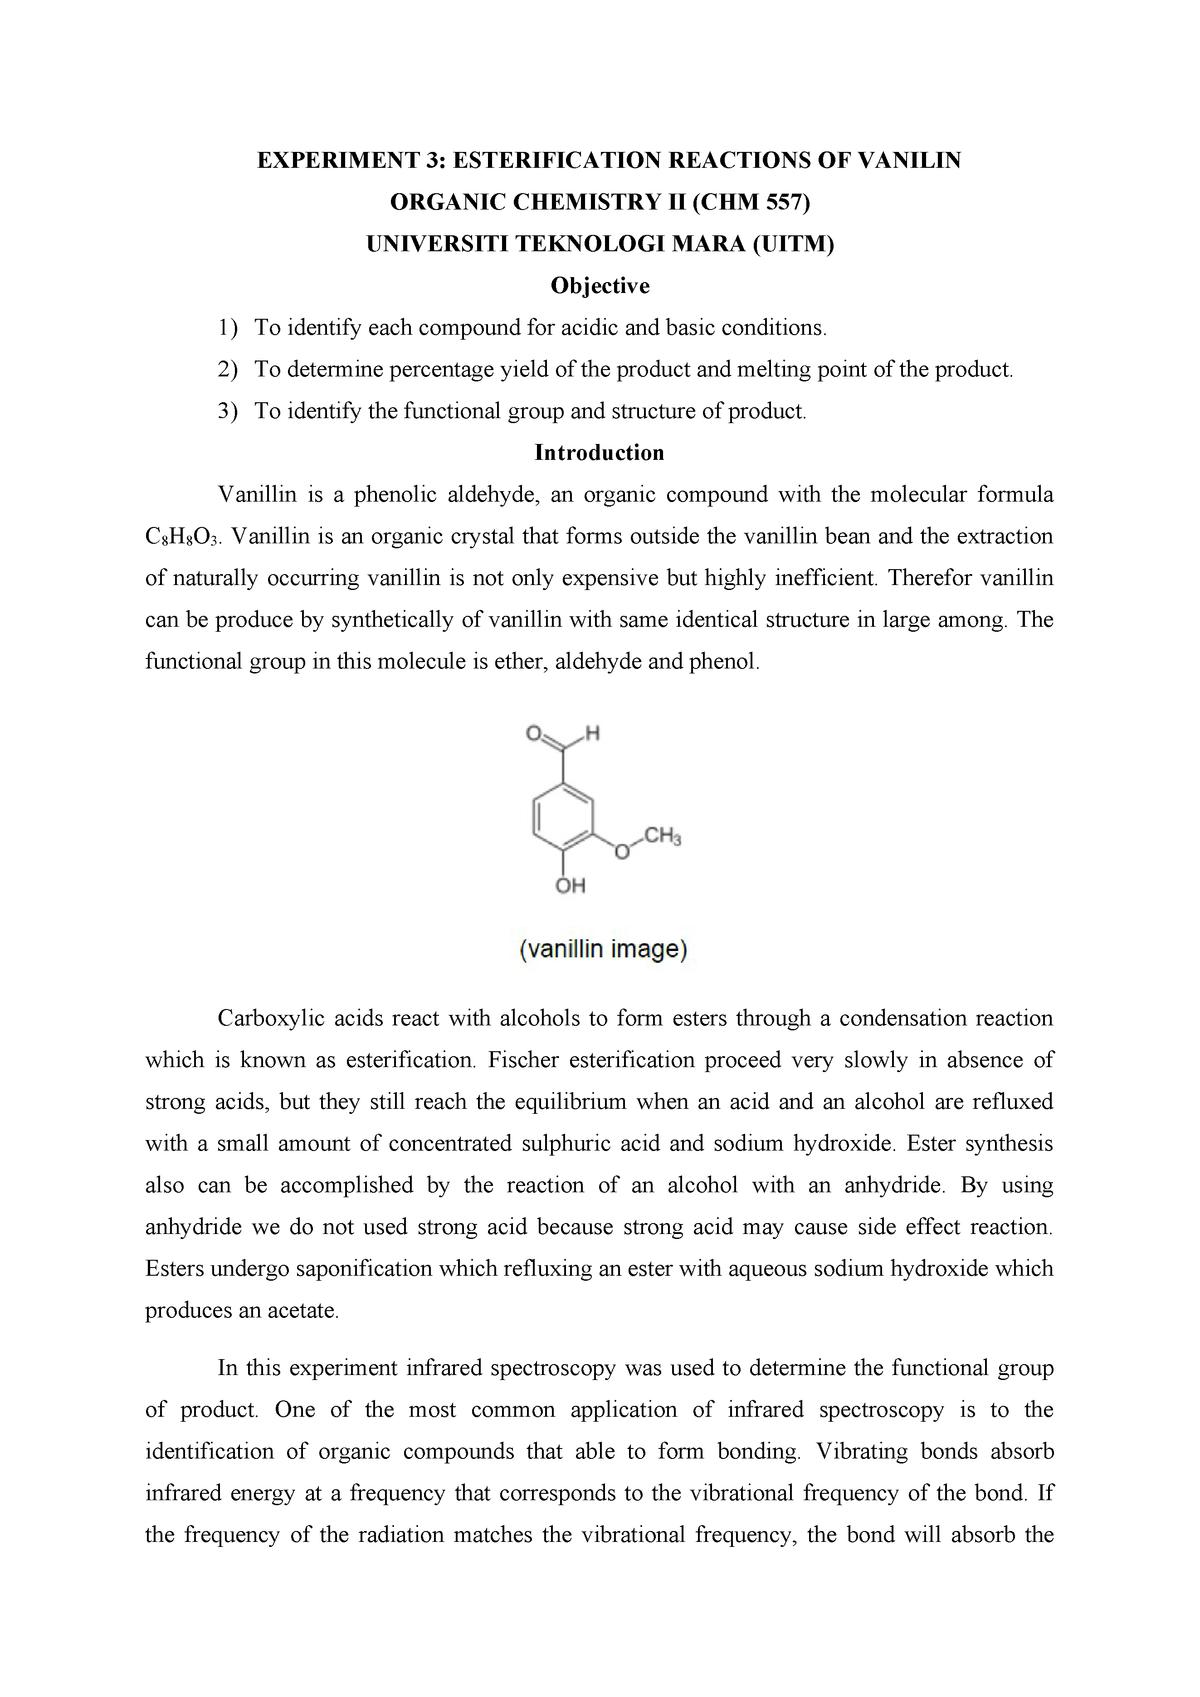 ESTERIFICATION REACTIONS OF VANILIN SLIDE - CHM258